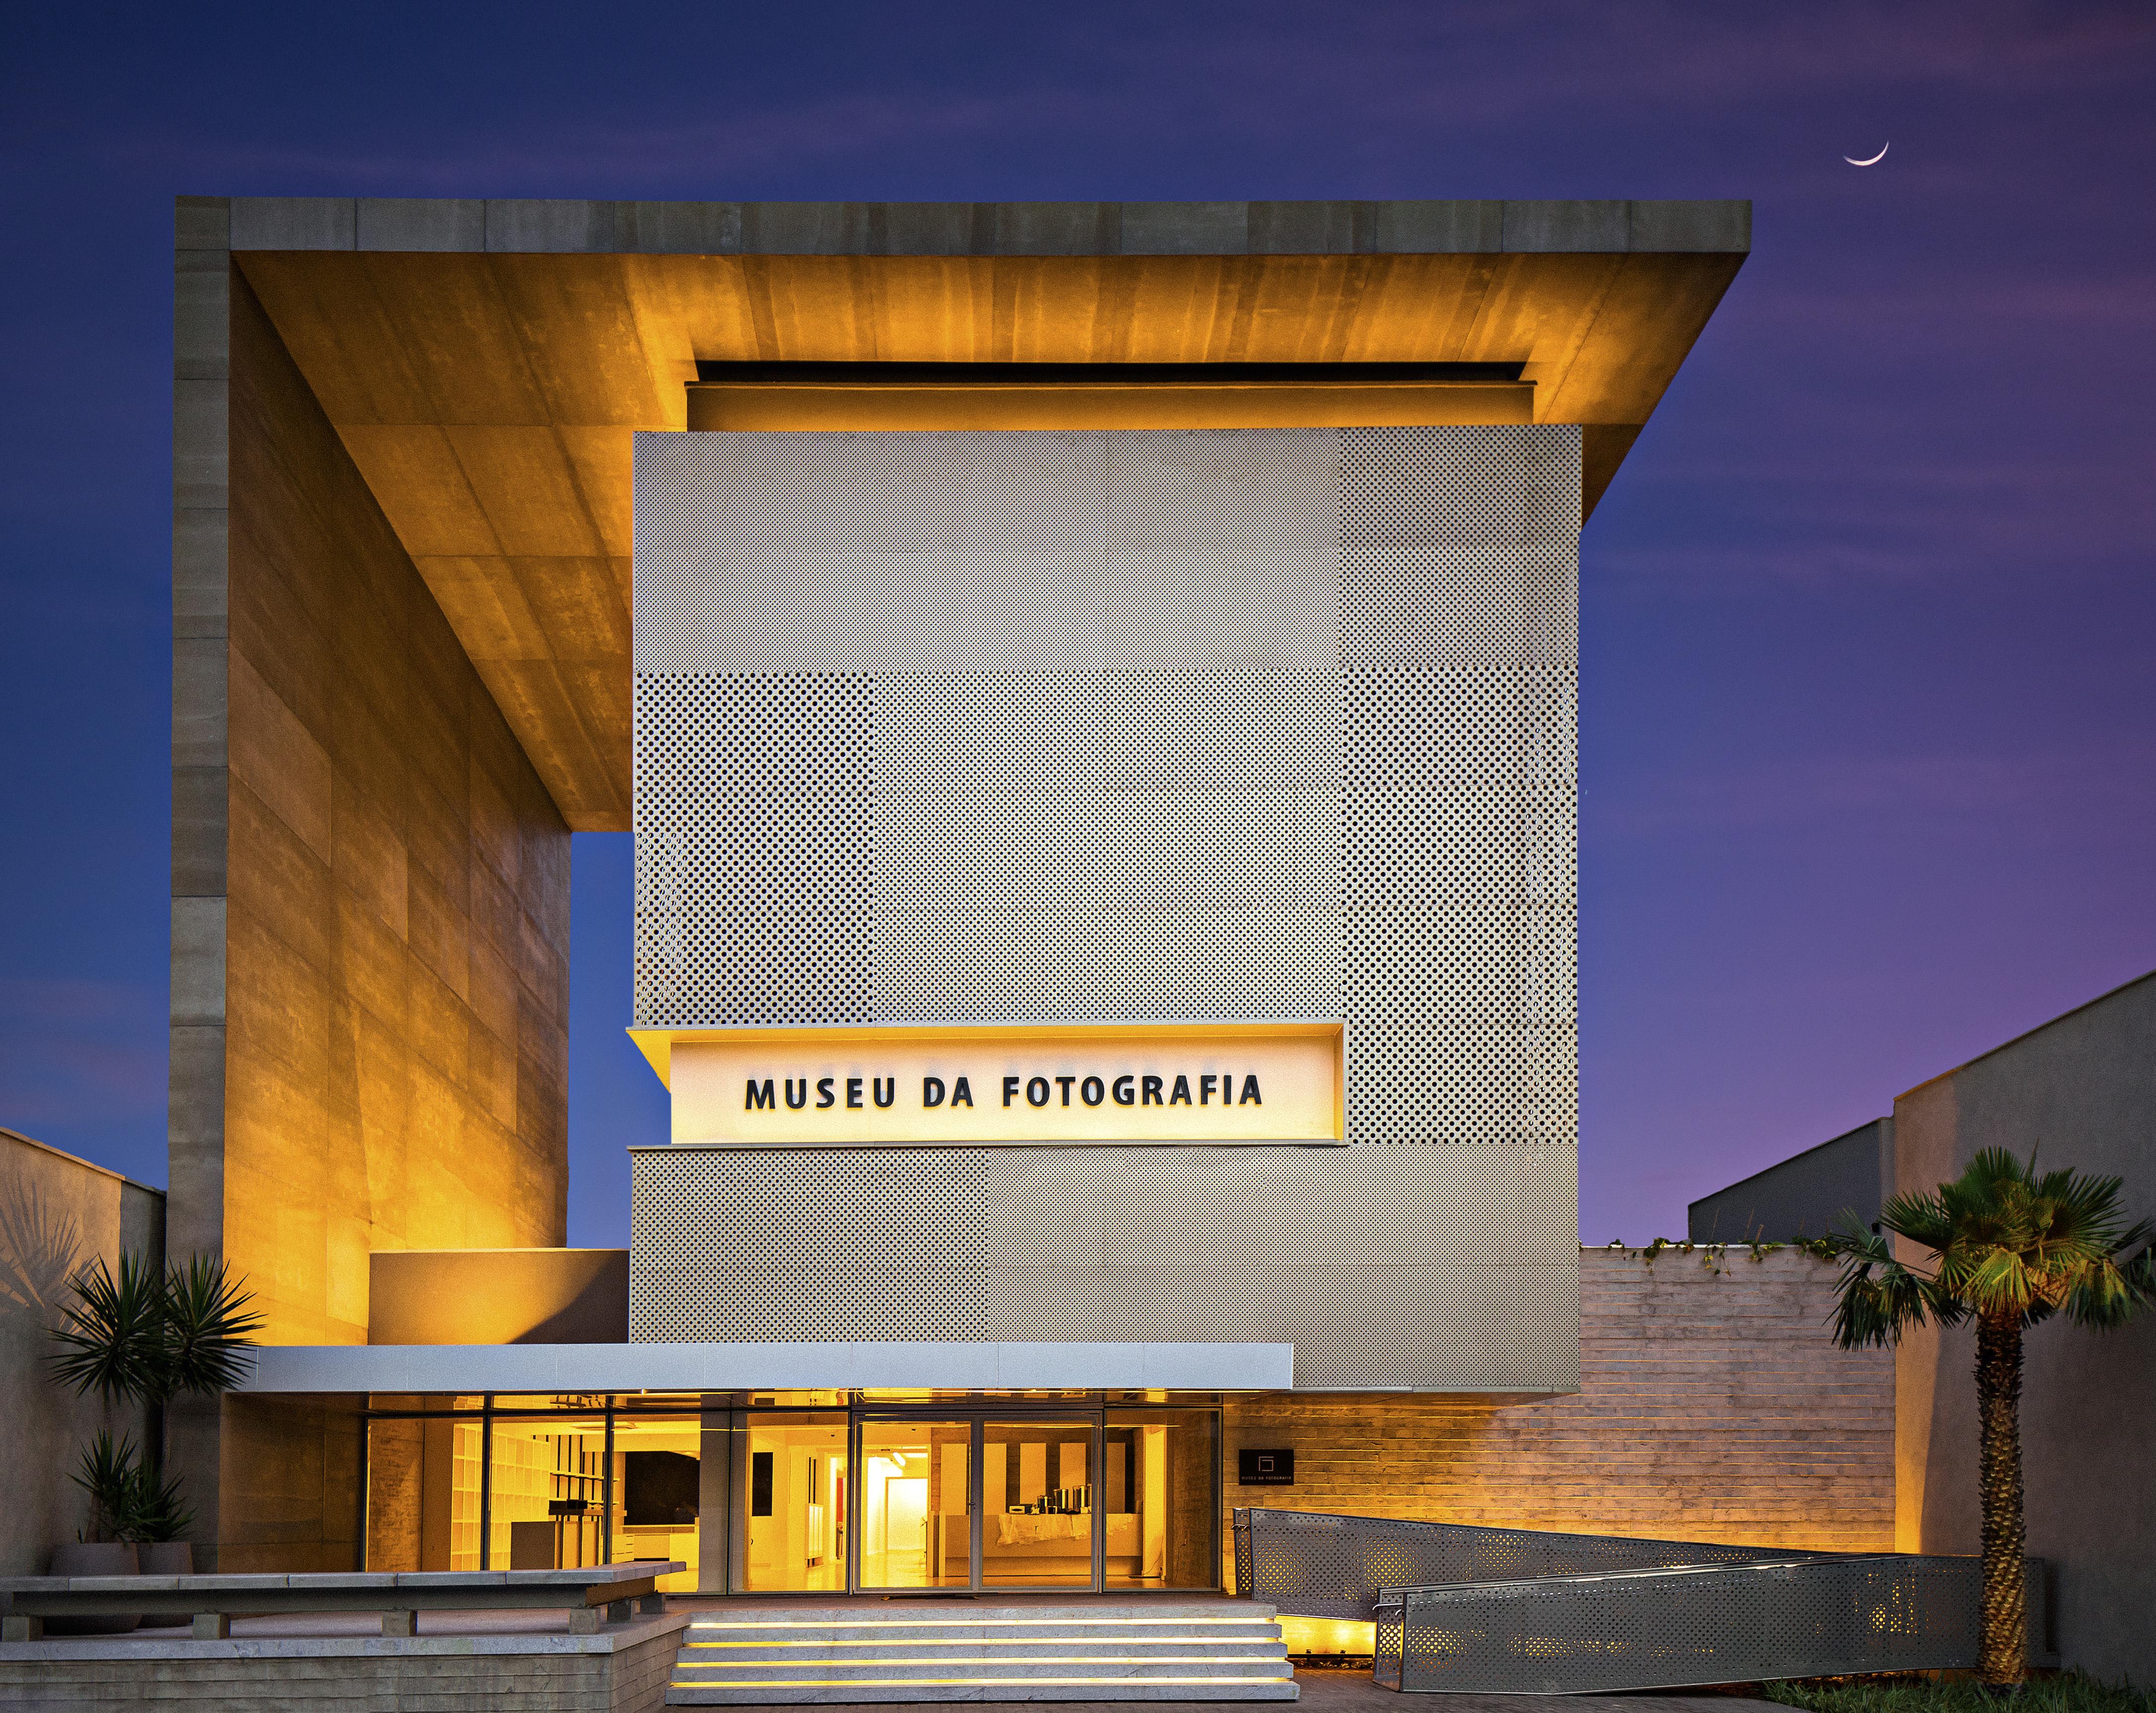 MUSEU DA FOTOGRAFIA